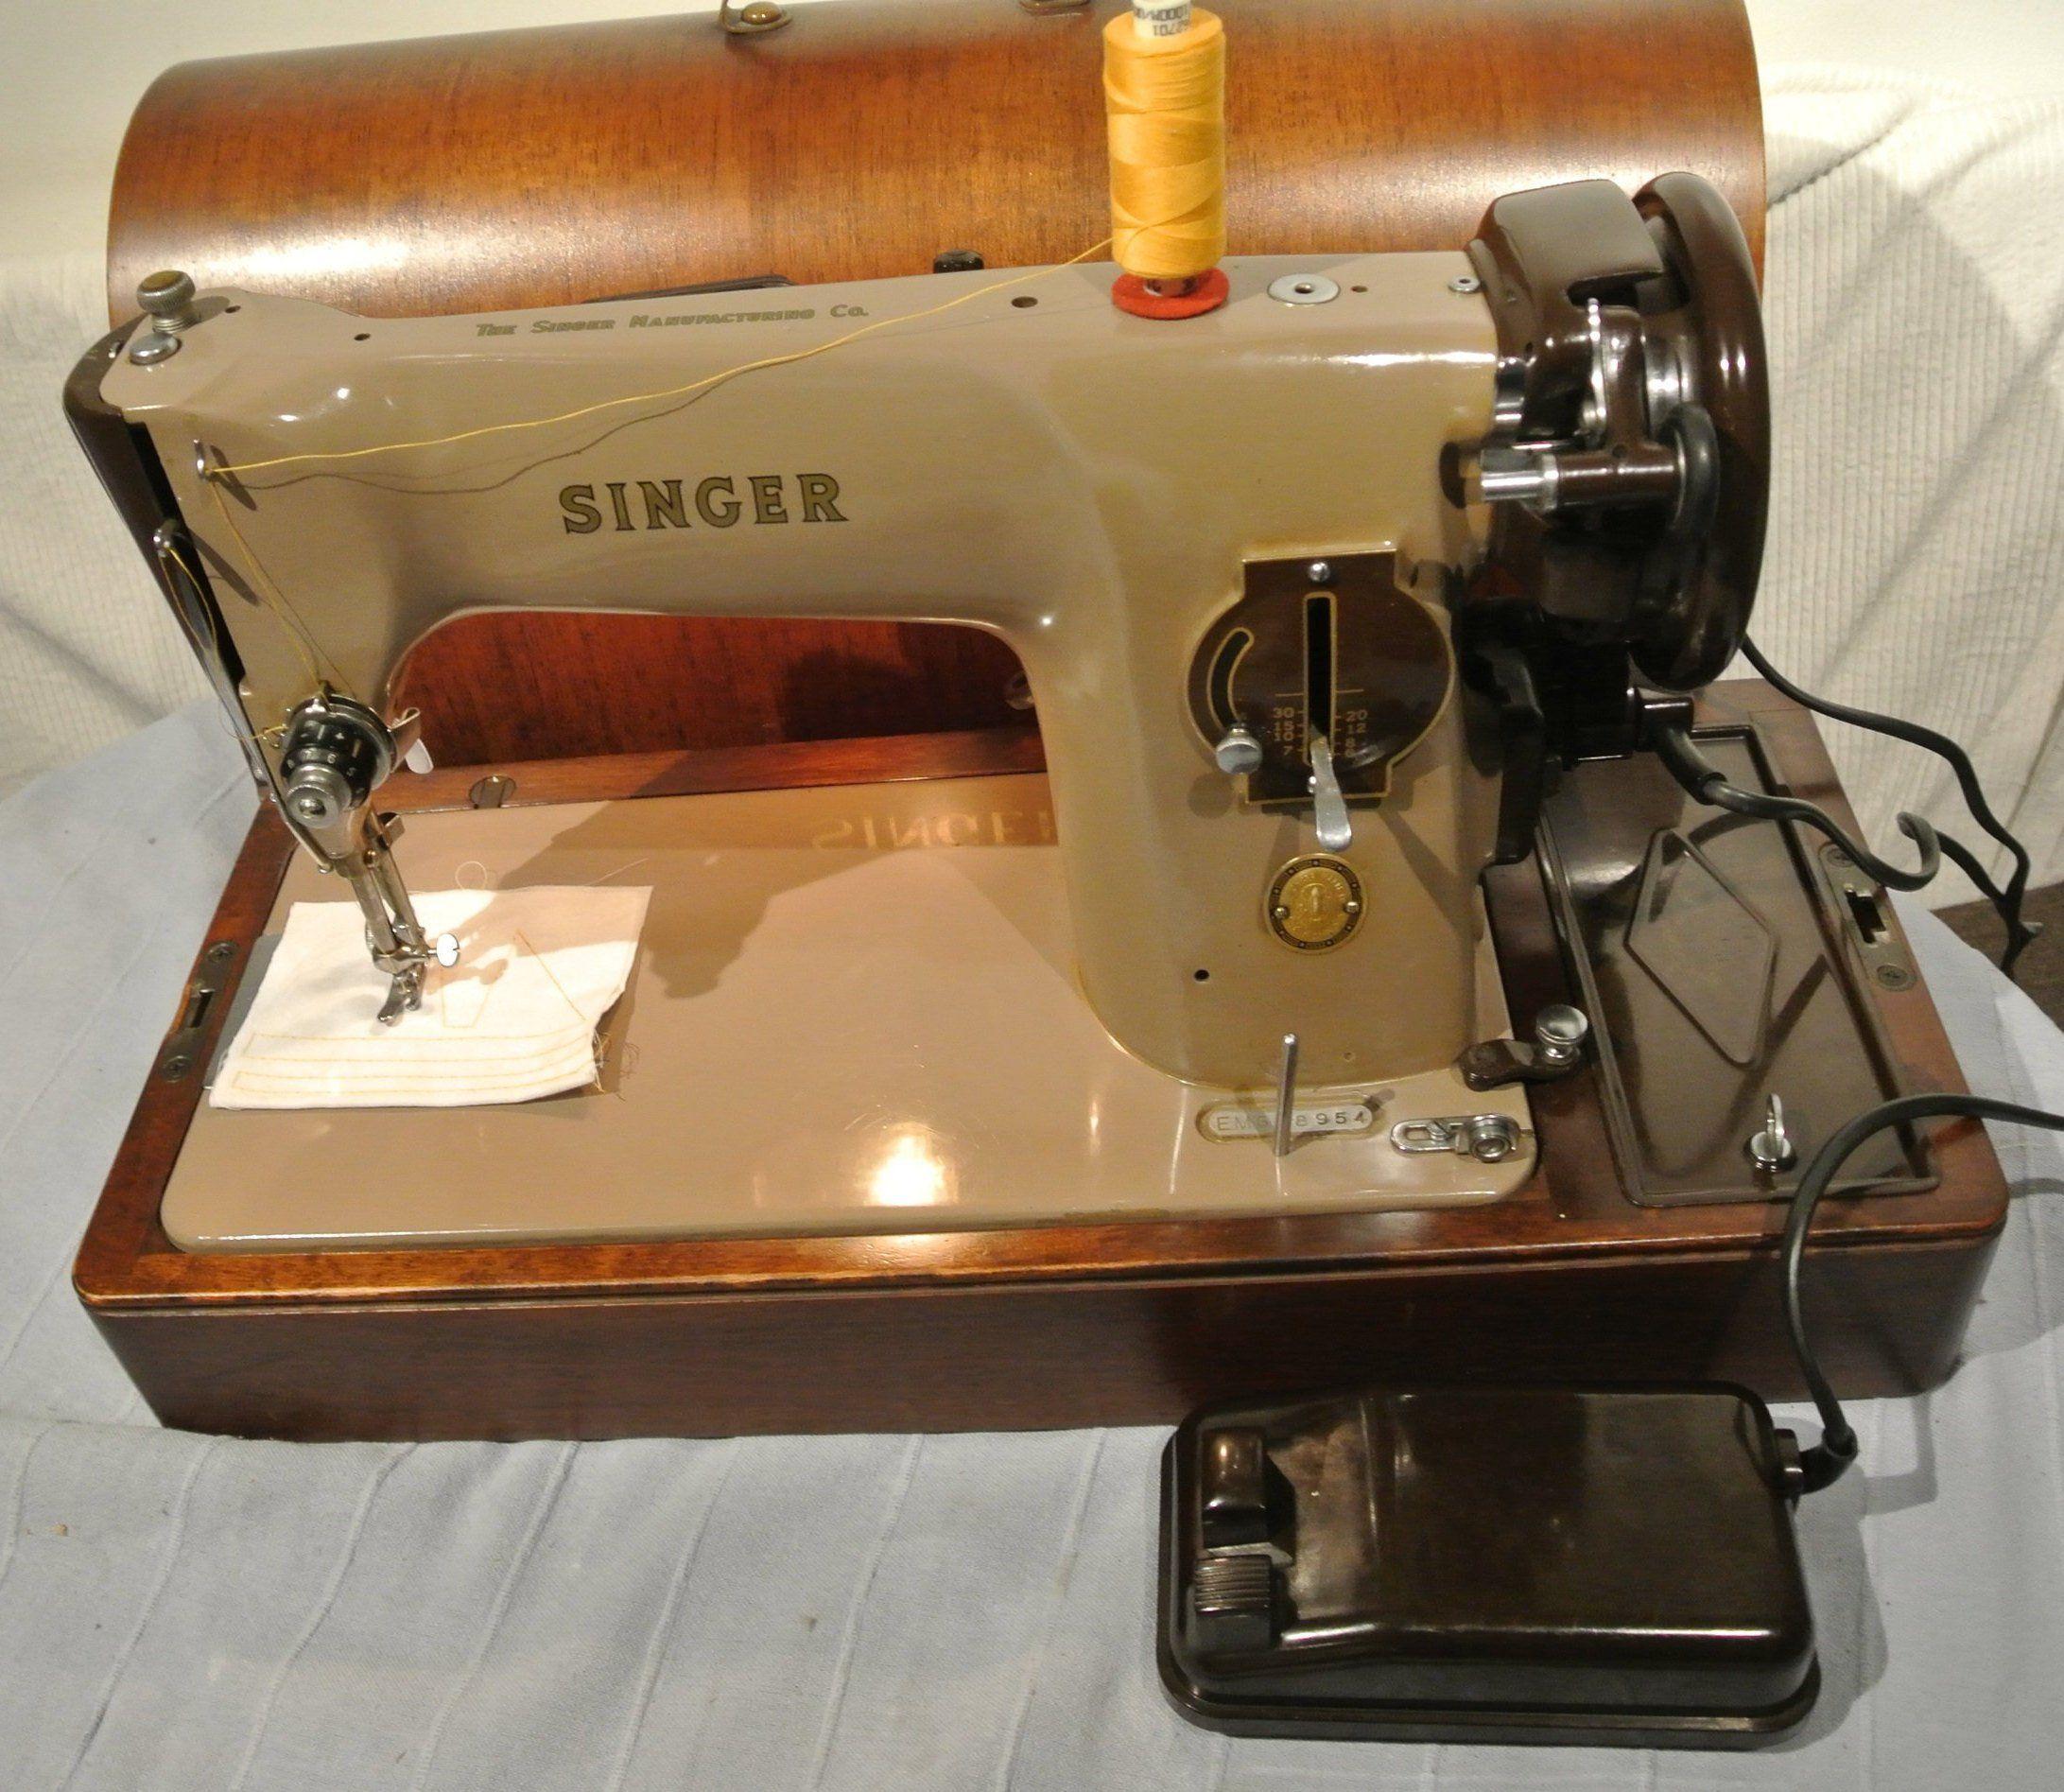 Vintage Singer 201k Aluminiun Electric Semi Industrial Sewing Machine Antique Singe Singer Sewing Machine Vintage Old Sewing Machines Industrial Sewing Machine